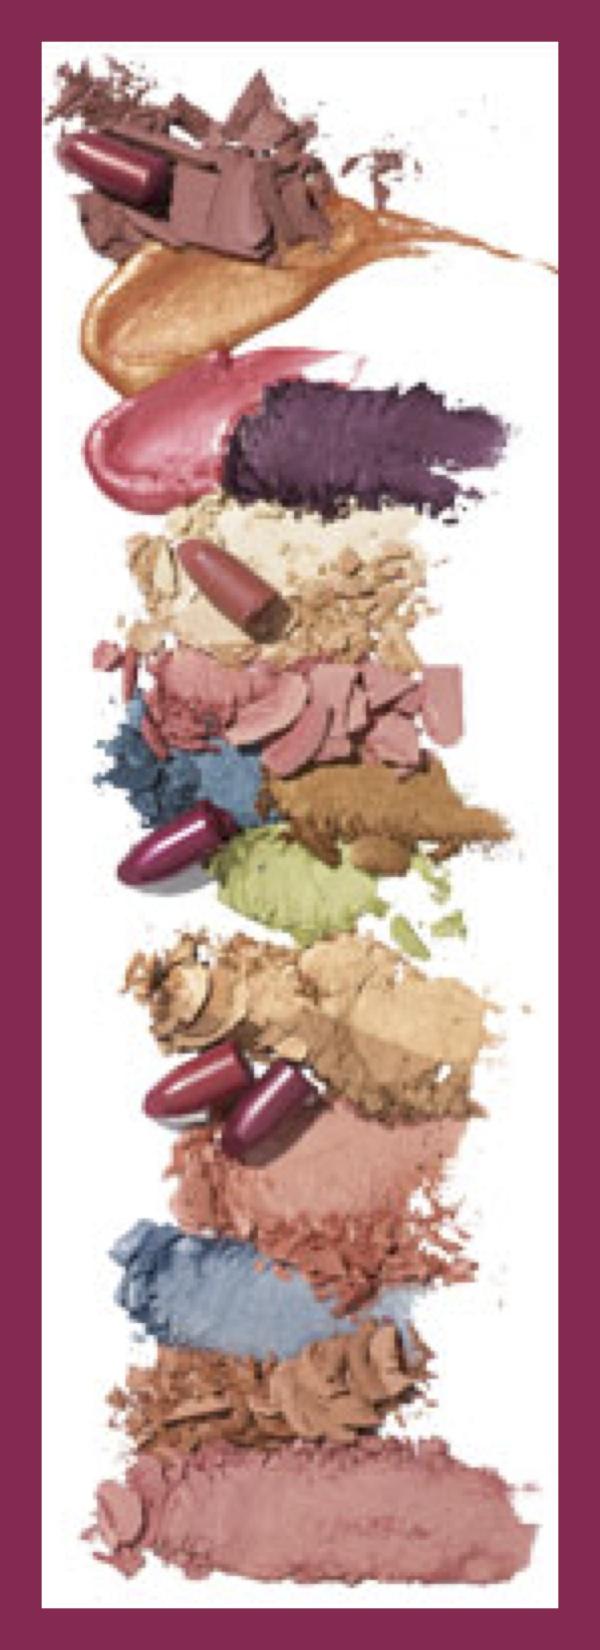 makeup image.jpg